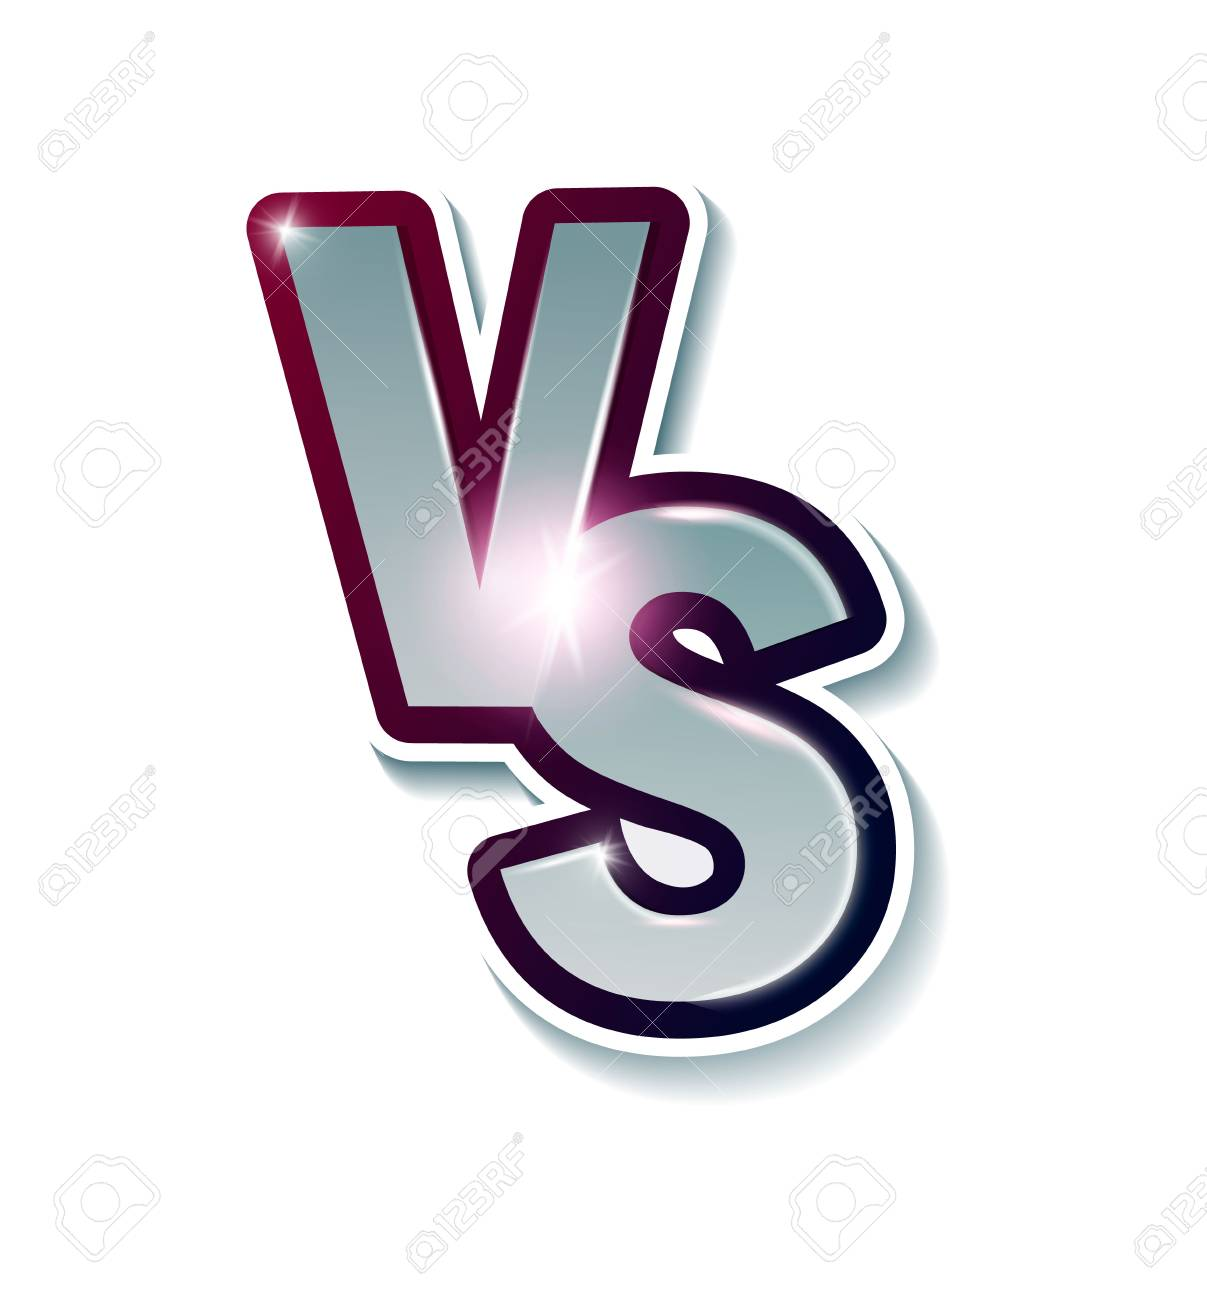 Versus Sign Like Opposition Concept Of Confrontation Together